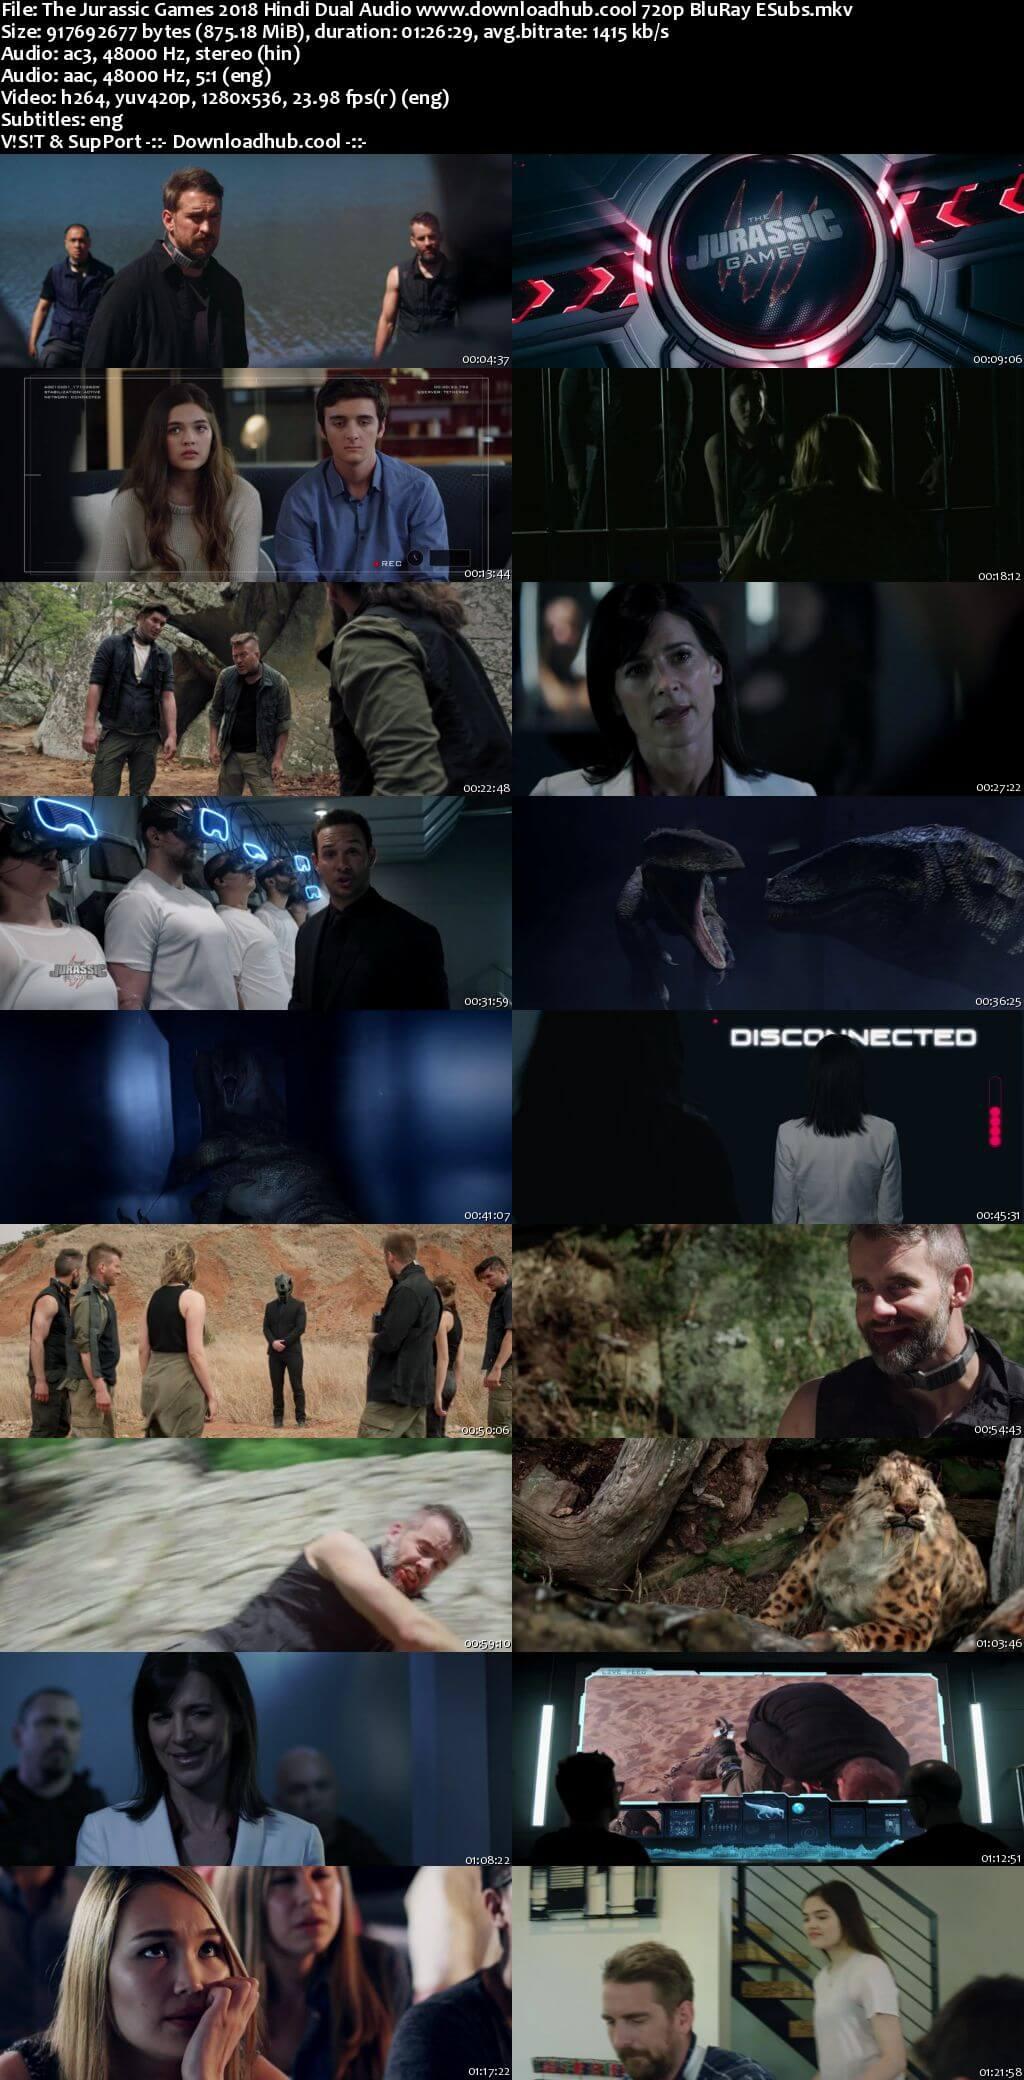 The Jurassic Games 2018 Hindi Dual Audio 720p BluRay ESubs